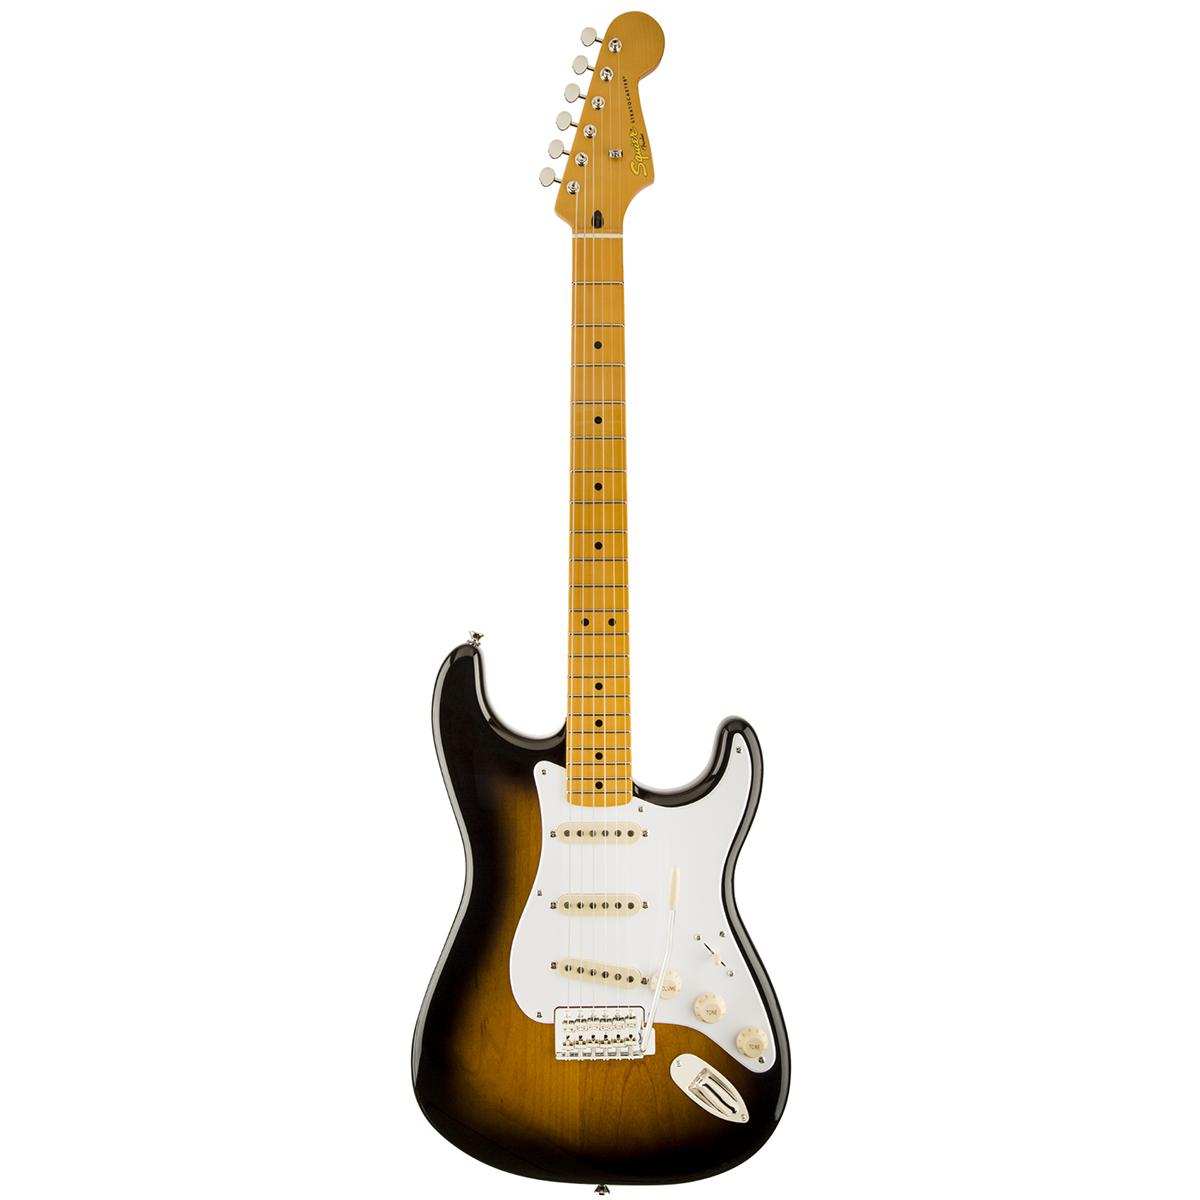 Billede af FenderSquier ClassicVibeStratocaster50s,MN,2TS el-guitar 2-tonesunburst